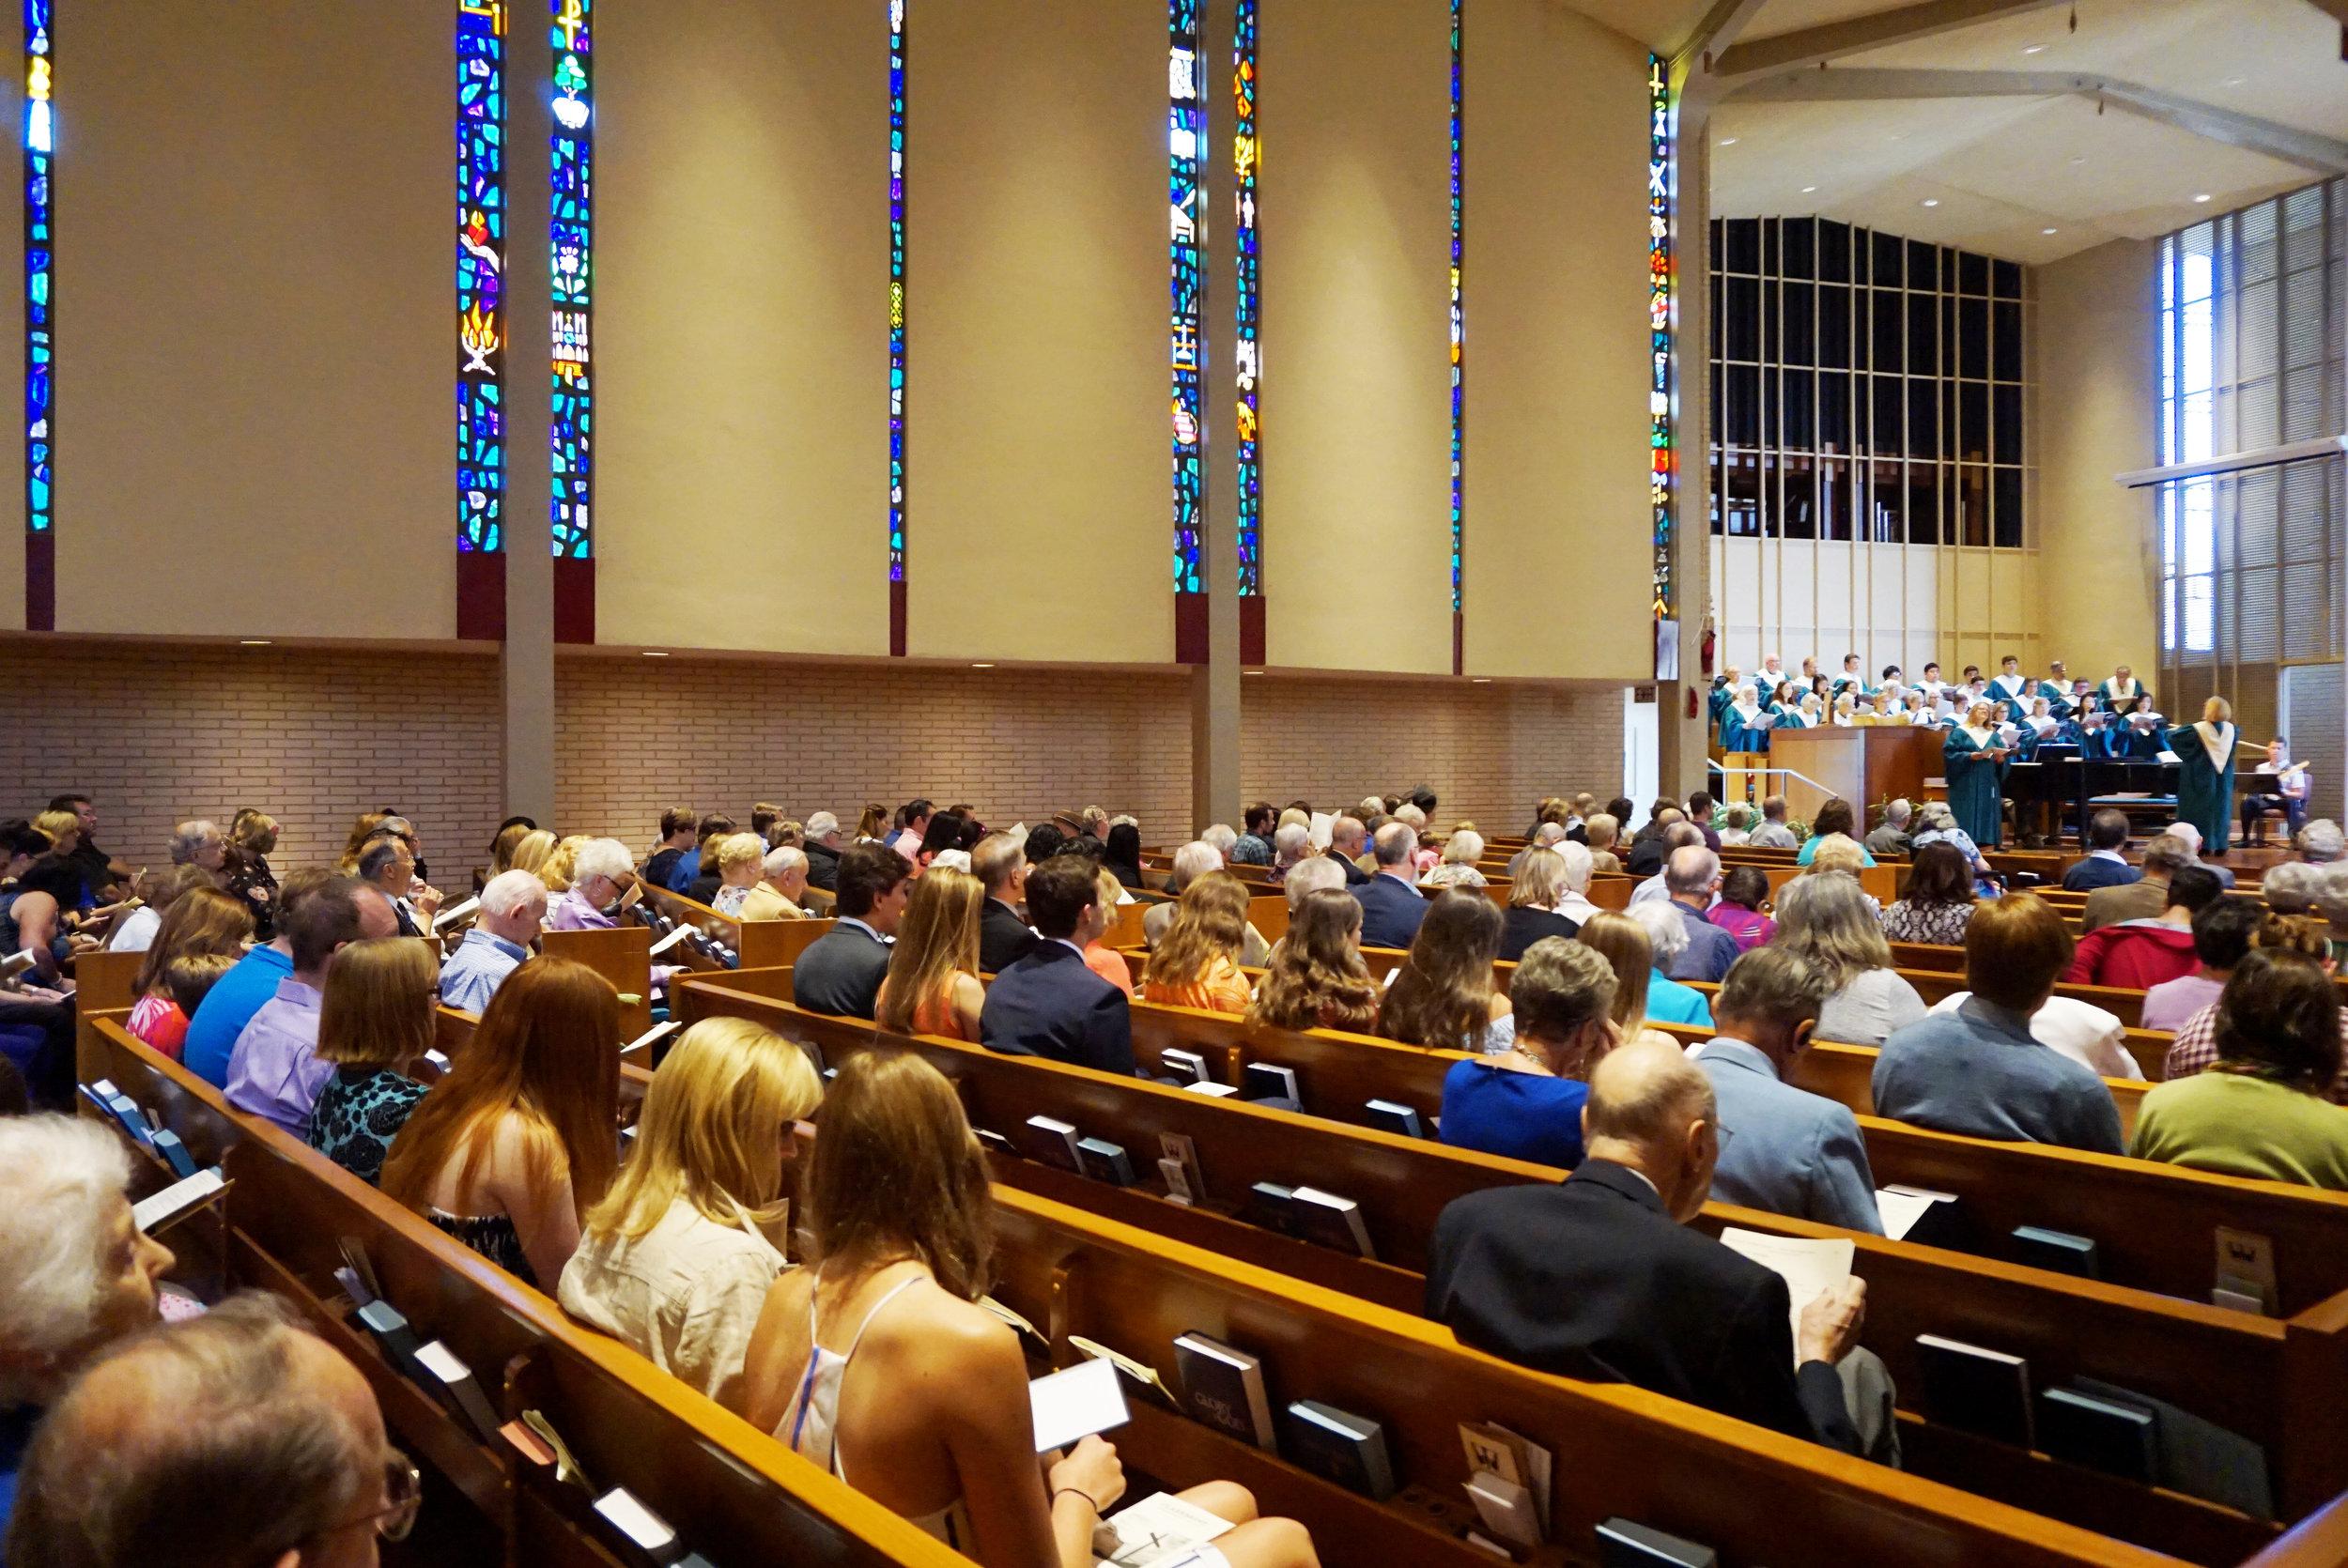 Claremont-Presbyterian-Church-Congregation-15.jpg